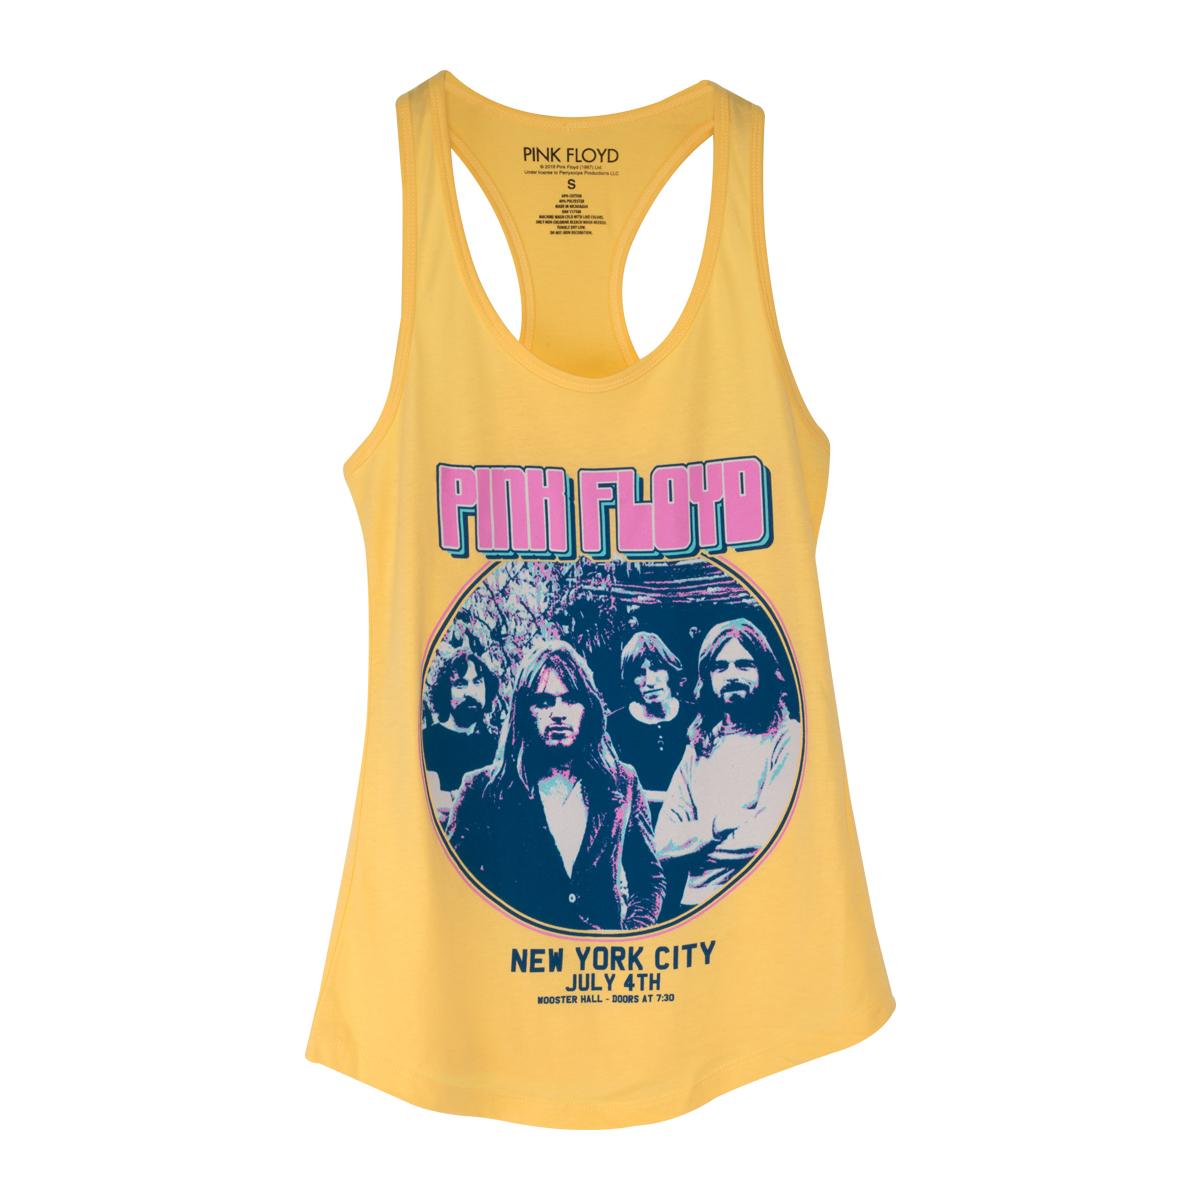 Pink Floyd New York City July 4th Circle Logo Yellow Tank